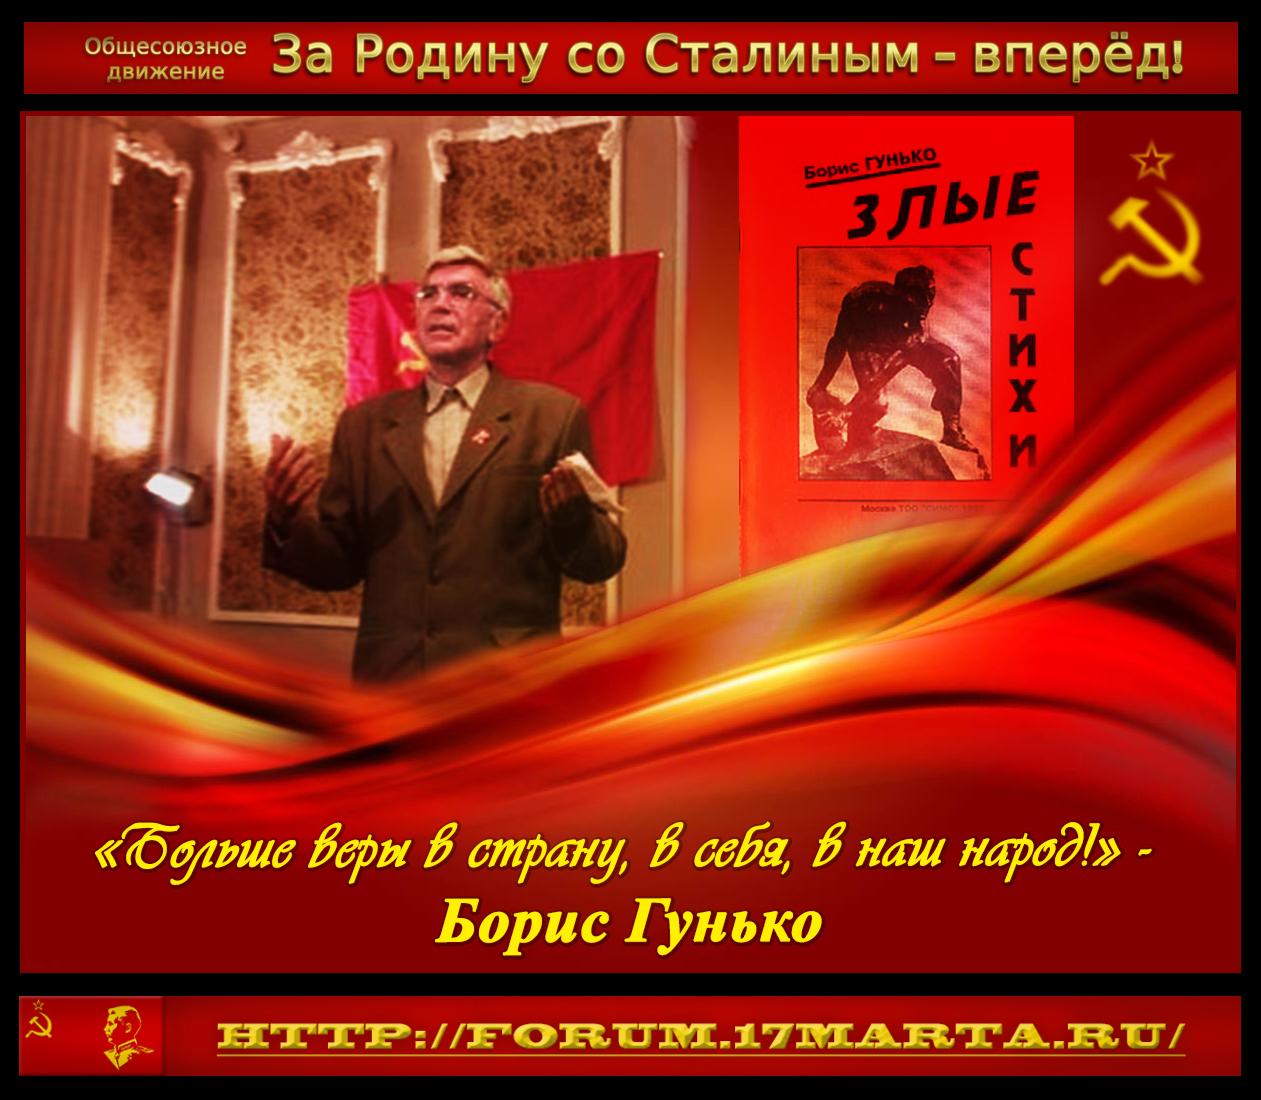 https://images.vfl.ru/ii/1531662952/fc665f56/22494249.jpg